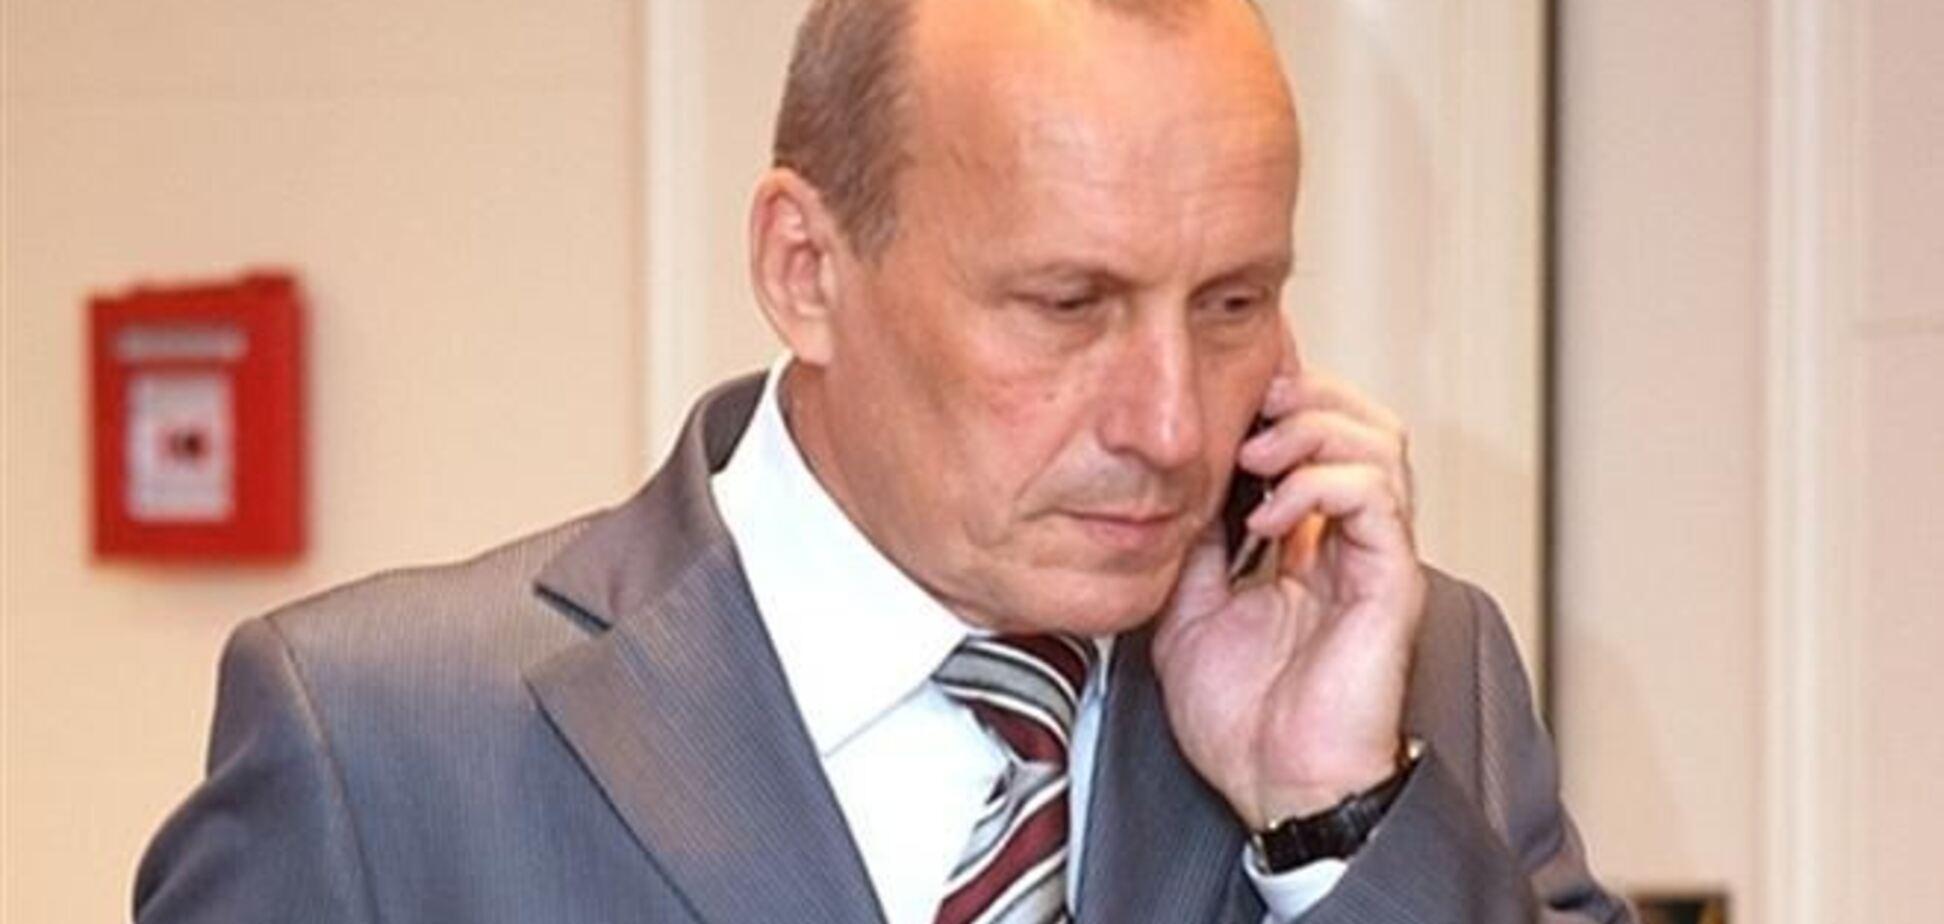 Суд уменьшил залог экс-главе 'Нафтогаза' Бакулину до 10 млн грн